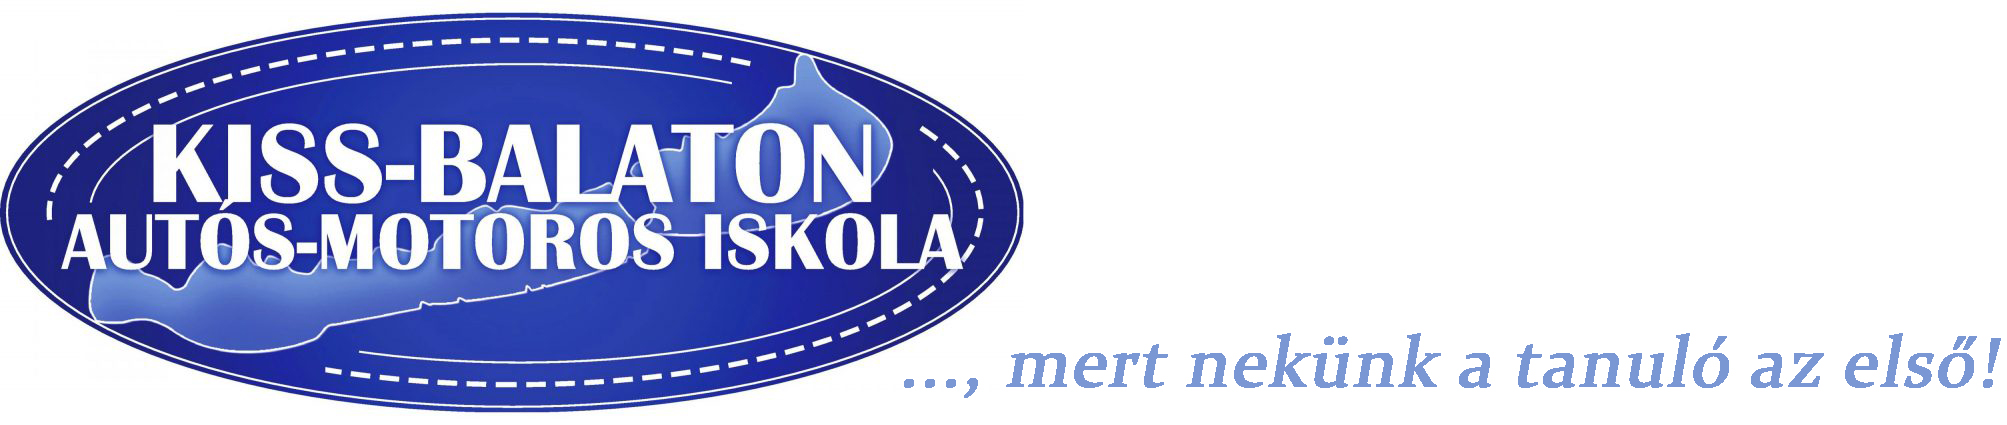 Kiss-Balaton Autós-Motoros Iskola